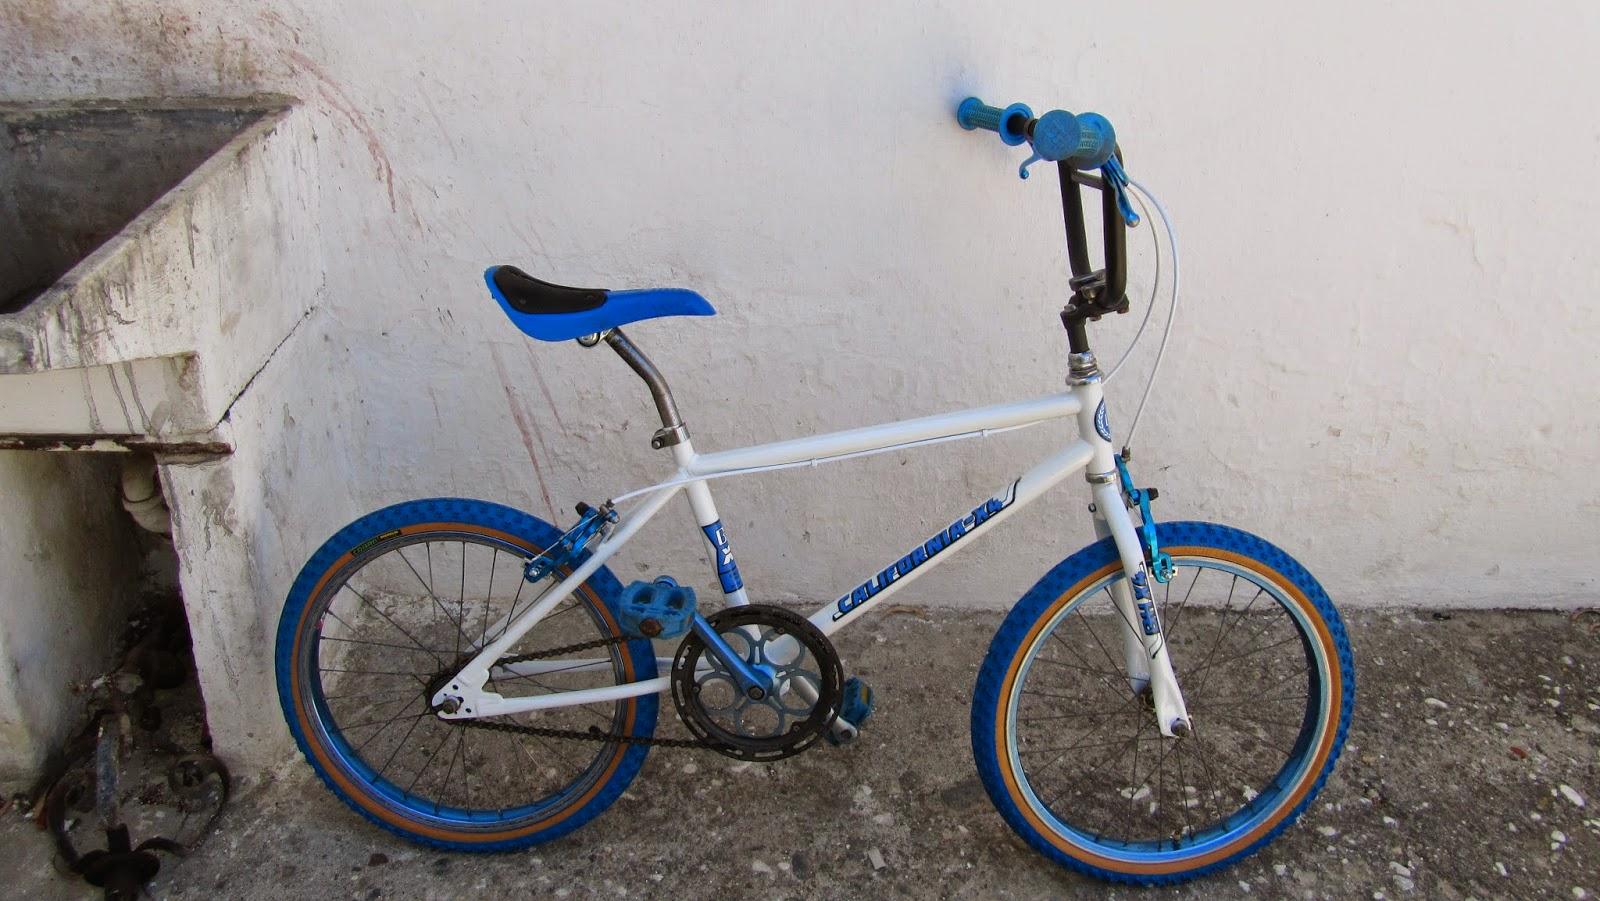 Bh California X4 azul